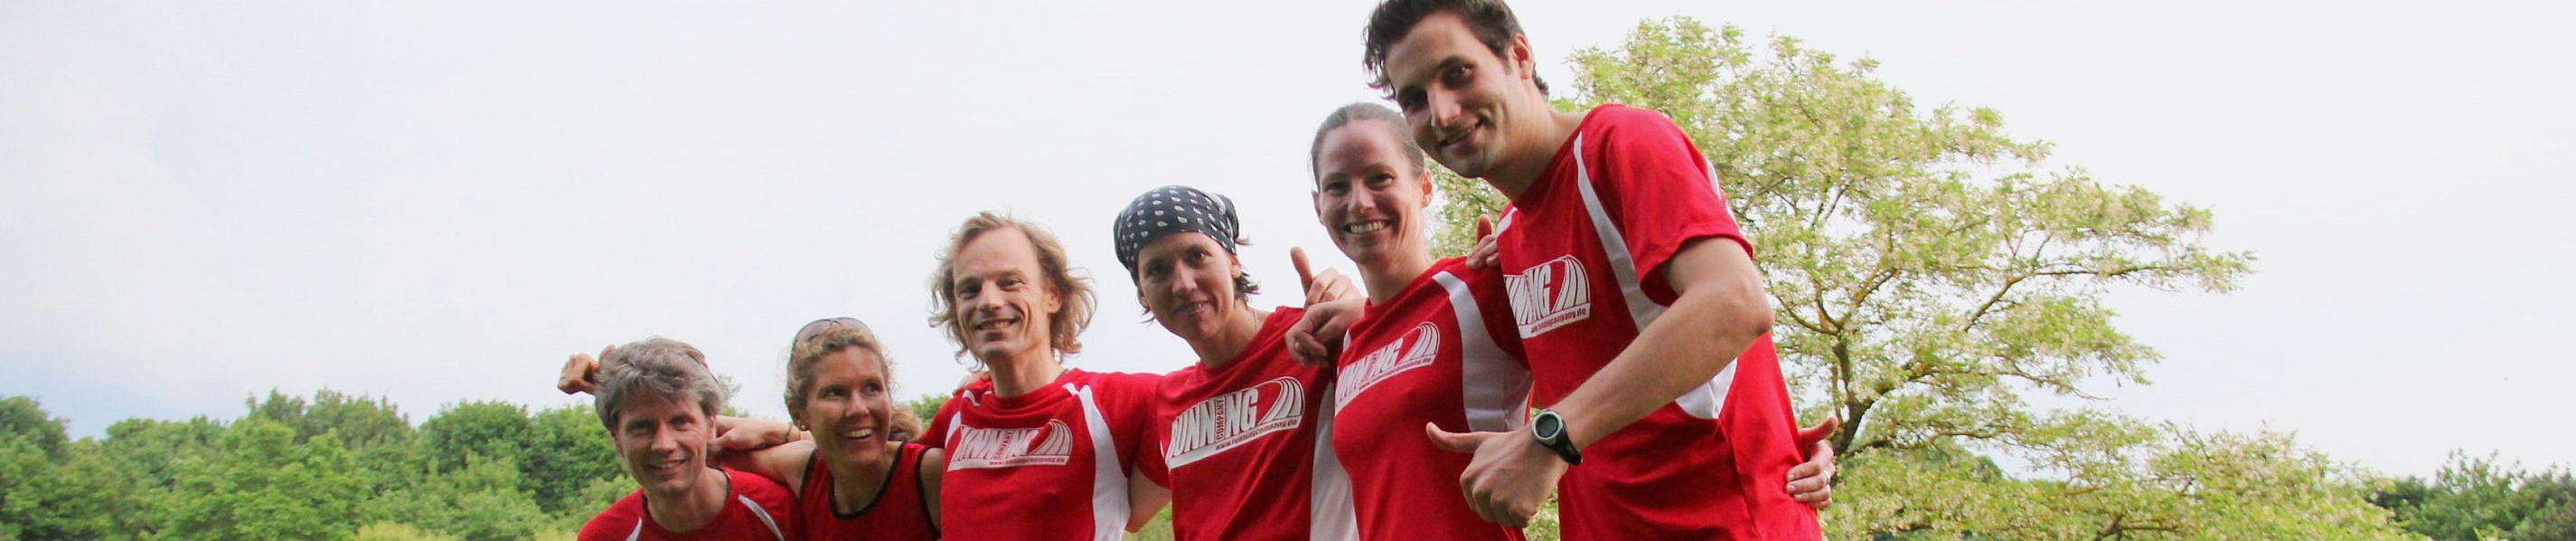 RUNNING Company Lauftrainer-Team